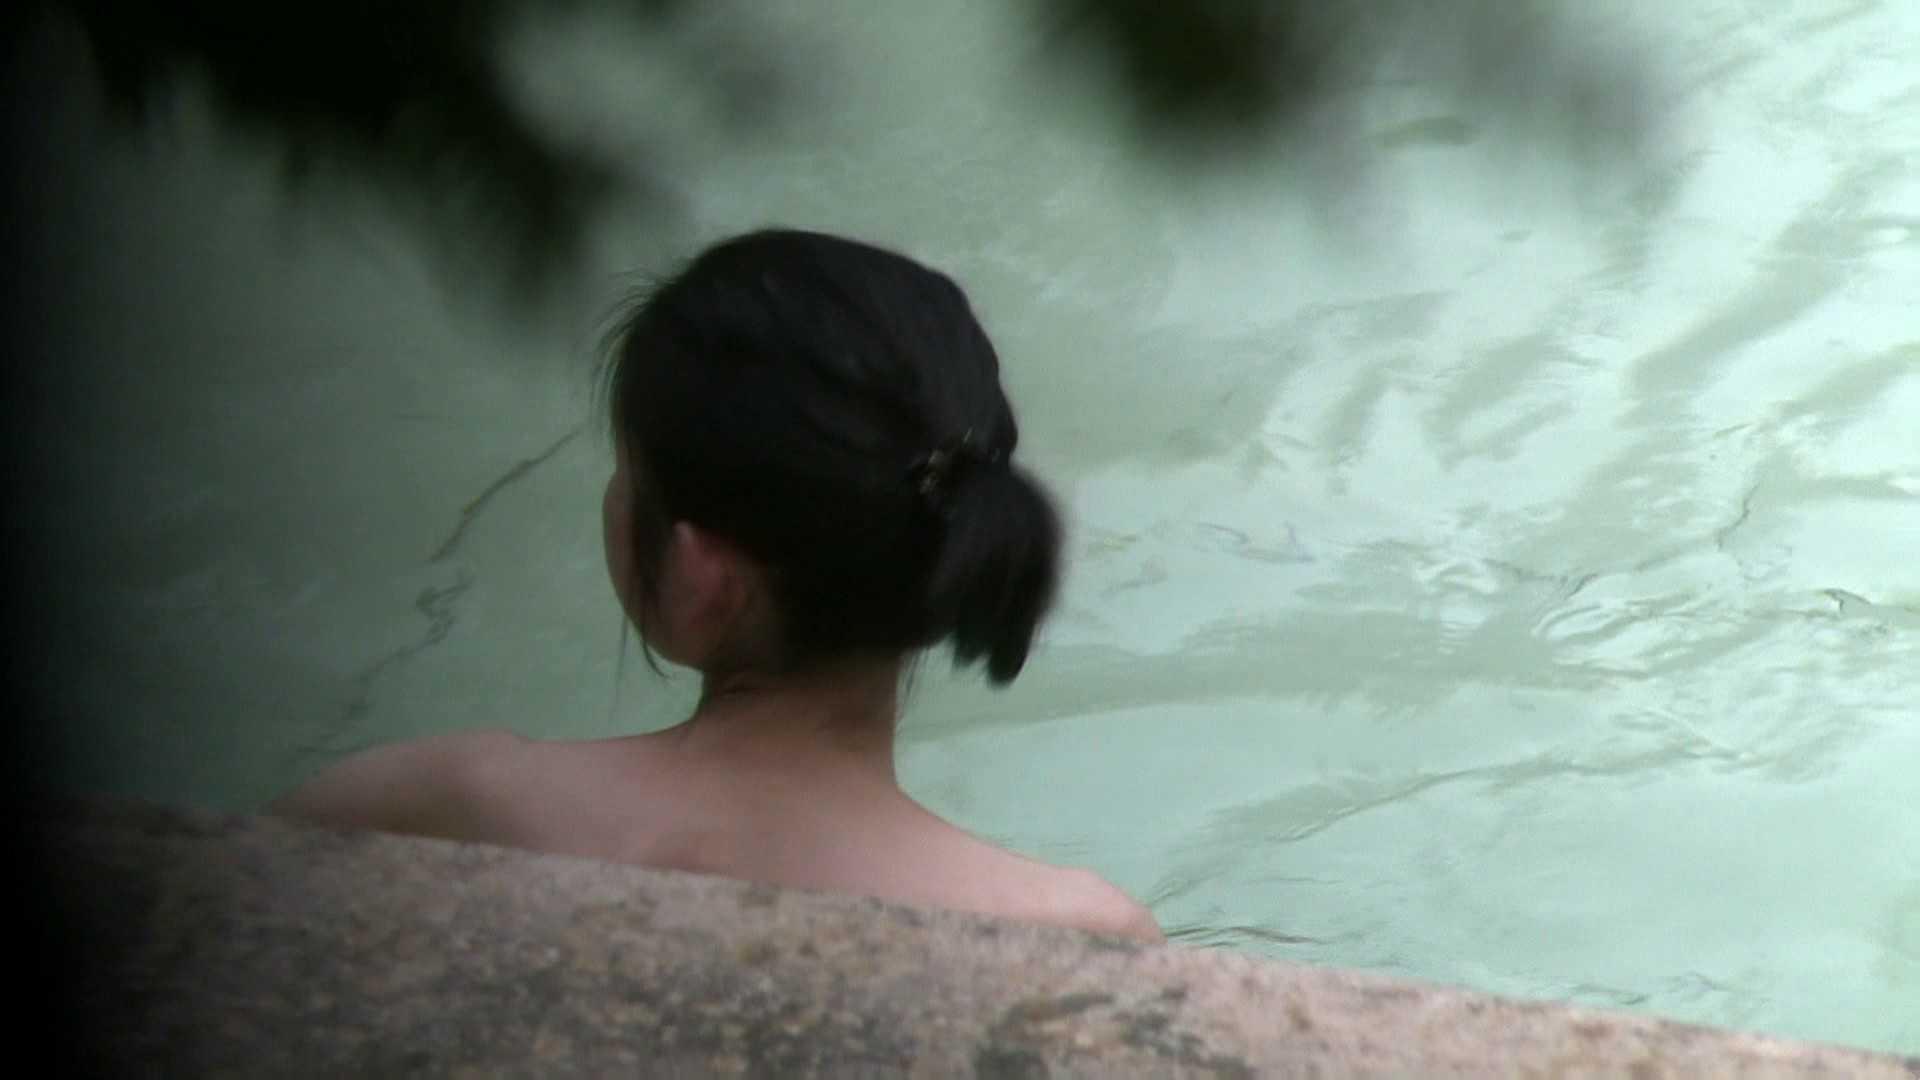 Aquaな露天風呂Vol.656 露天   HなOL  71pic 11